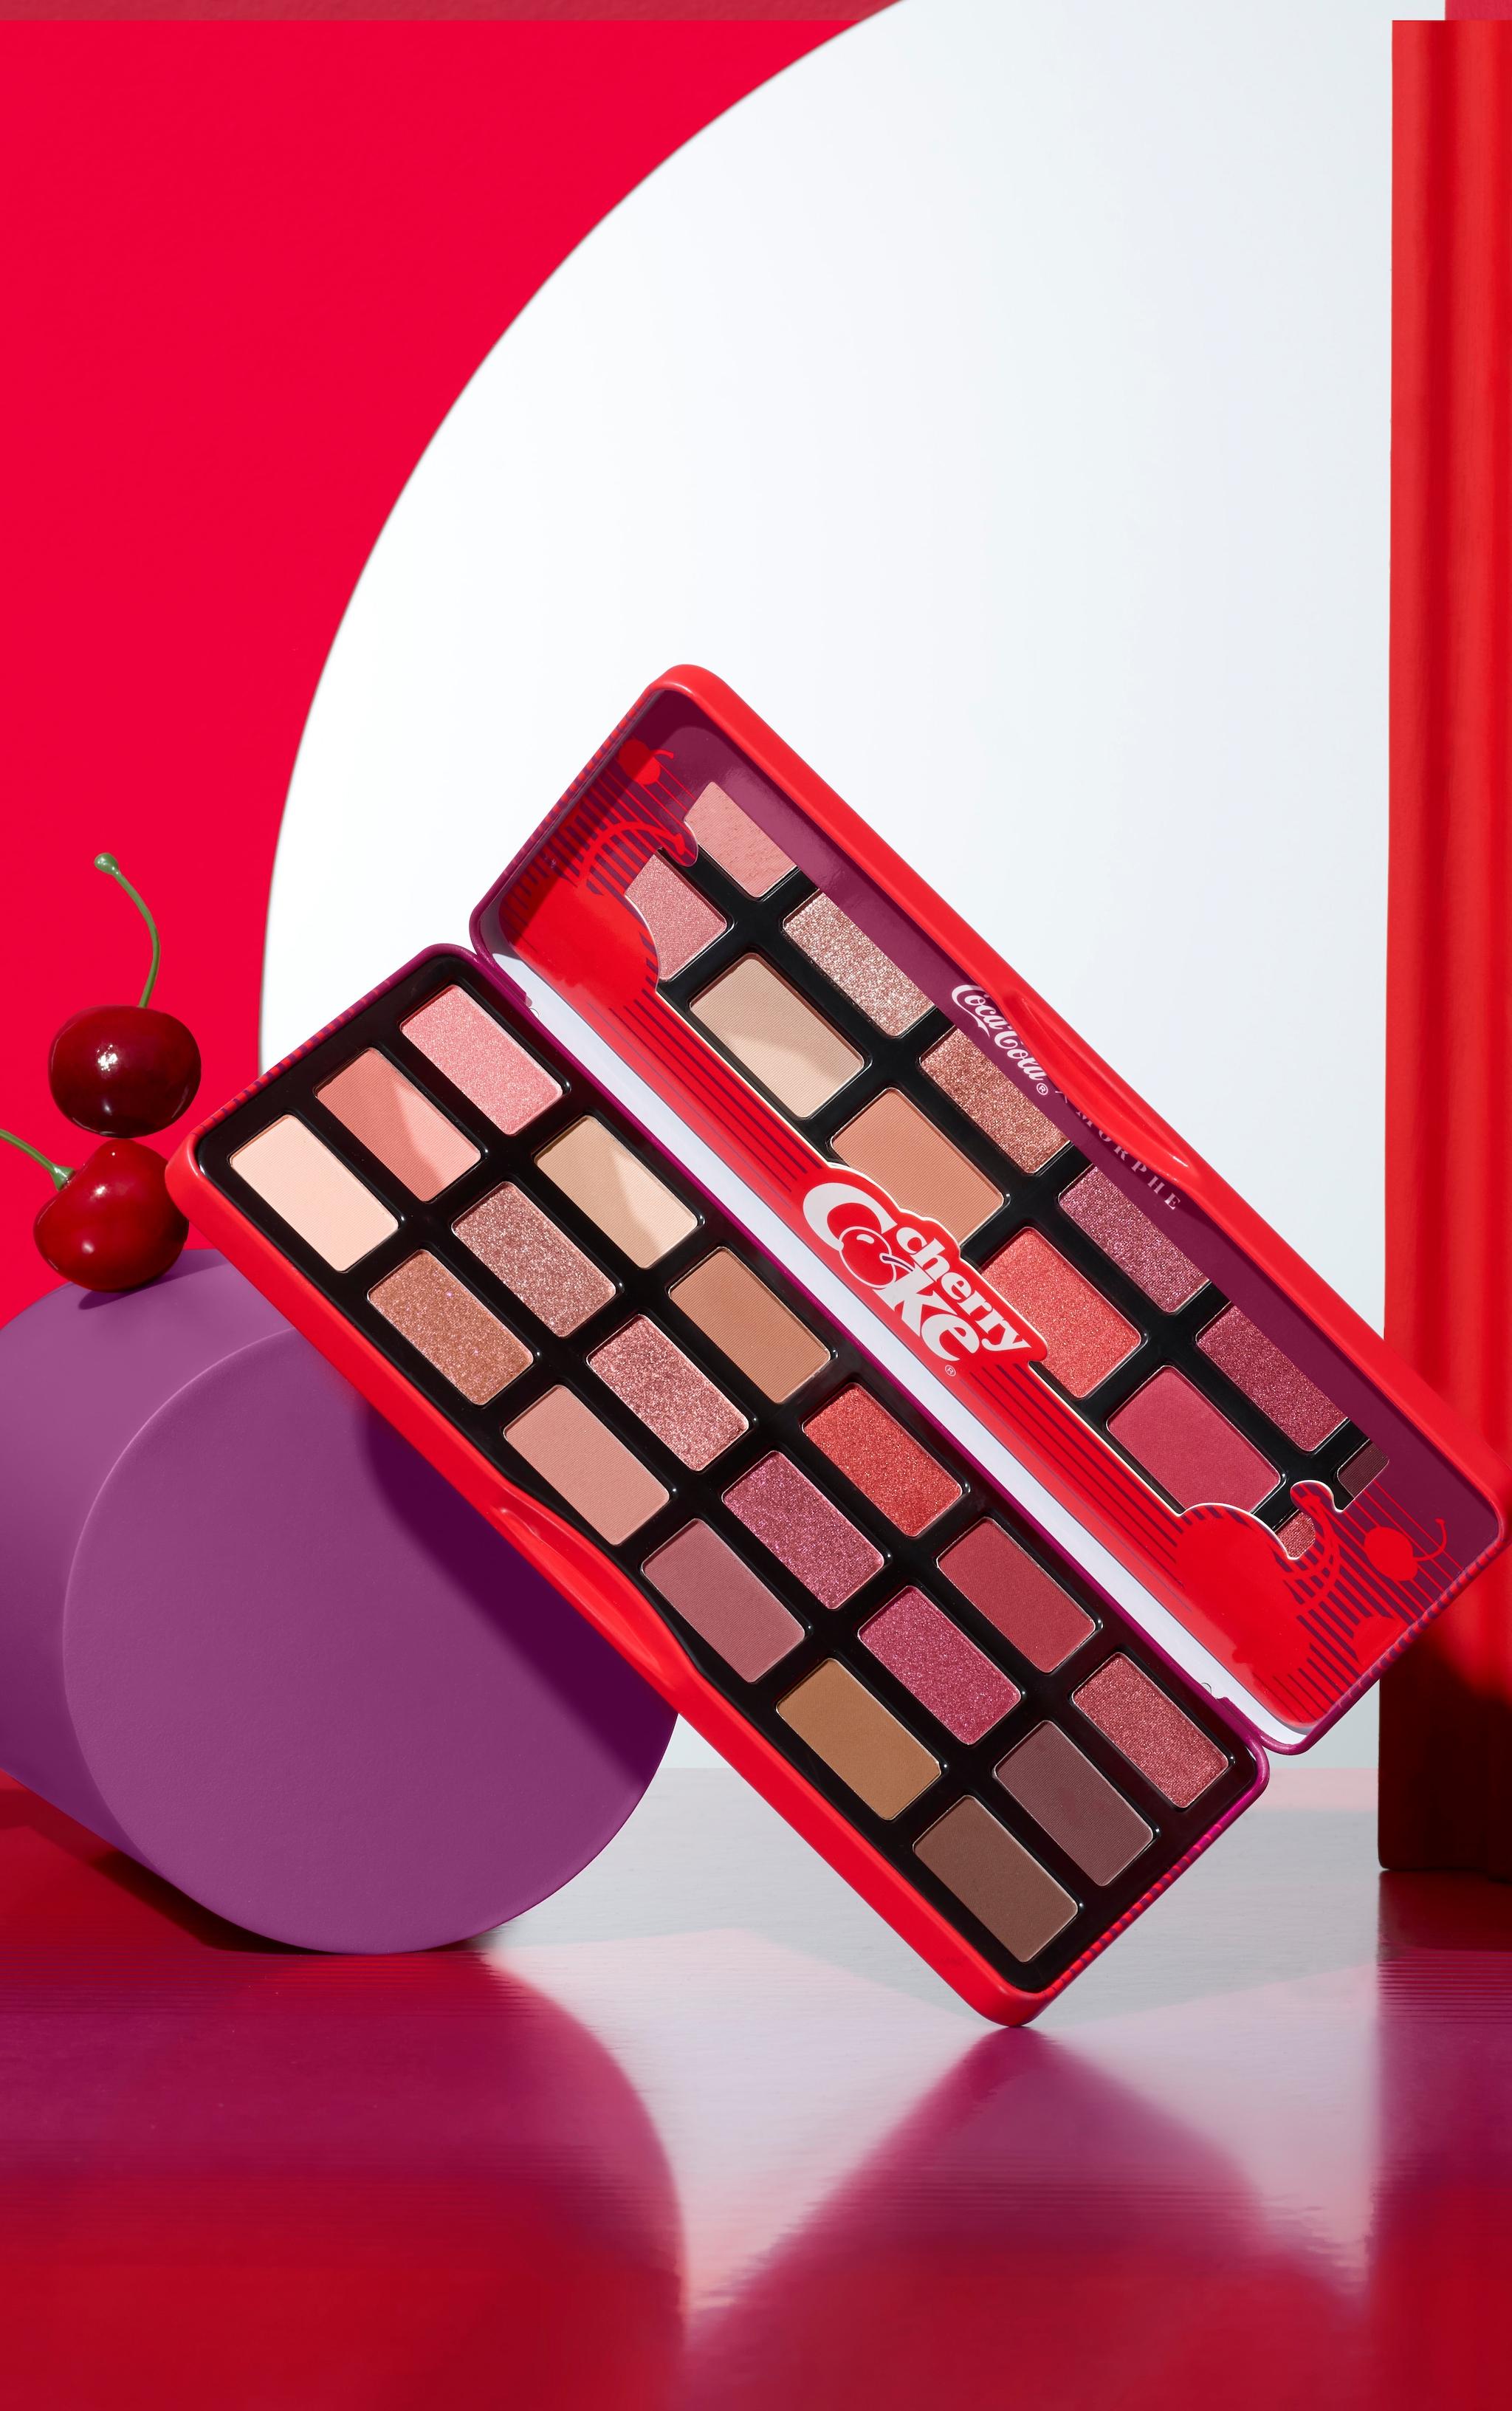 Coca-Cola X Morphe Cherry Coke Artistry Palette 1